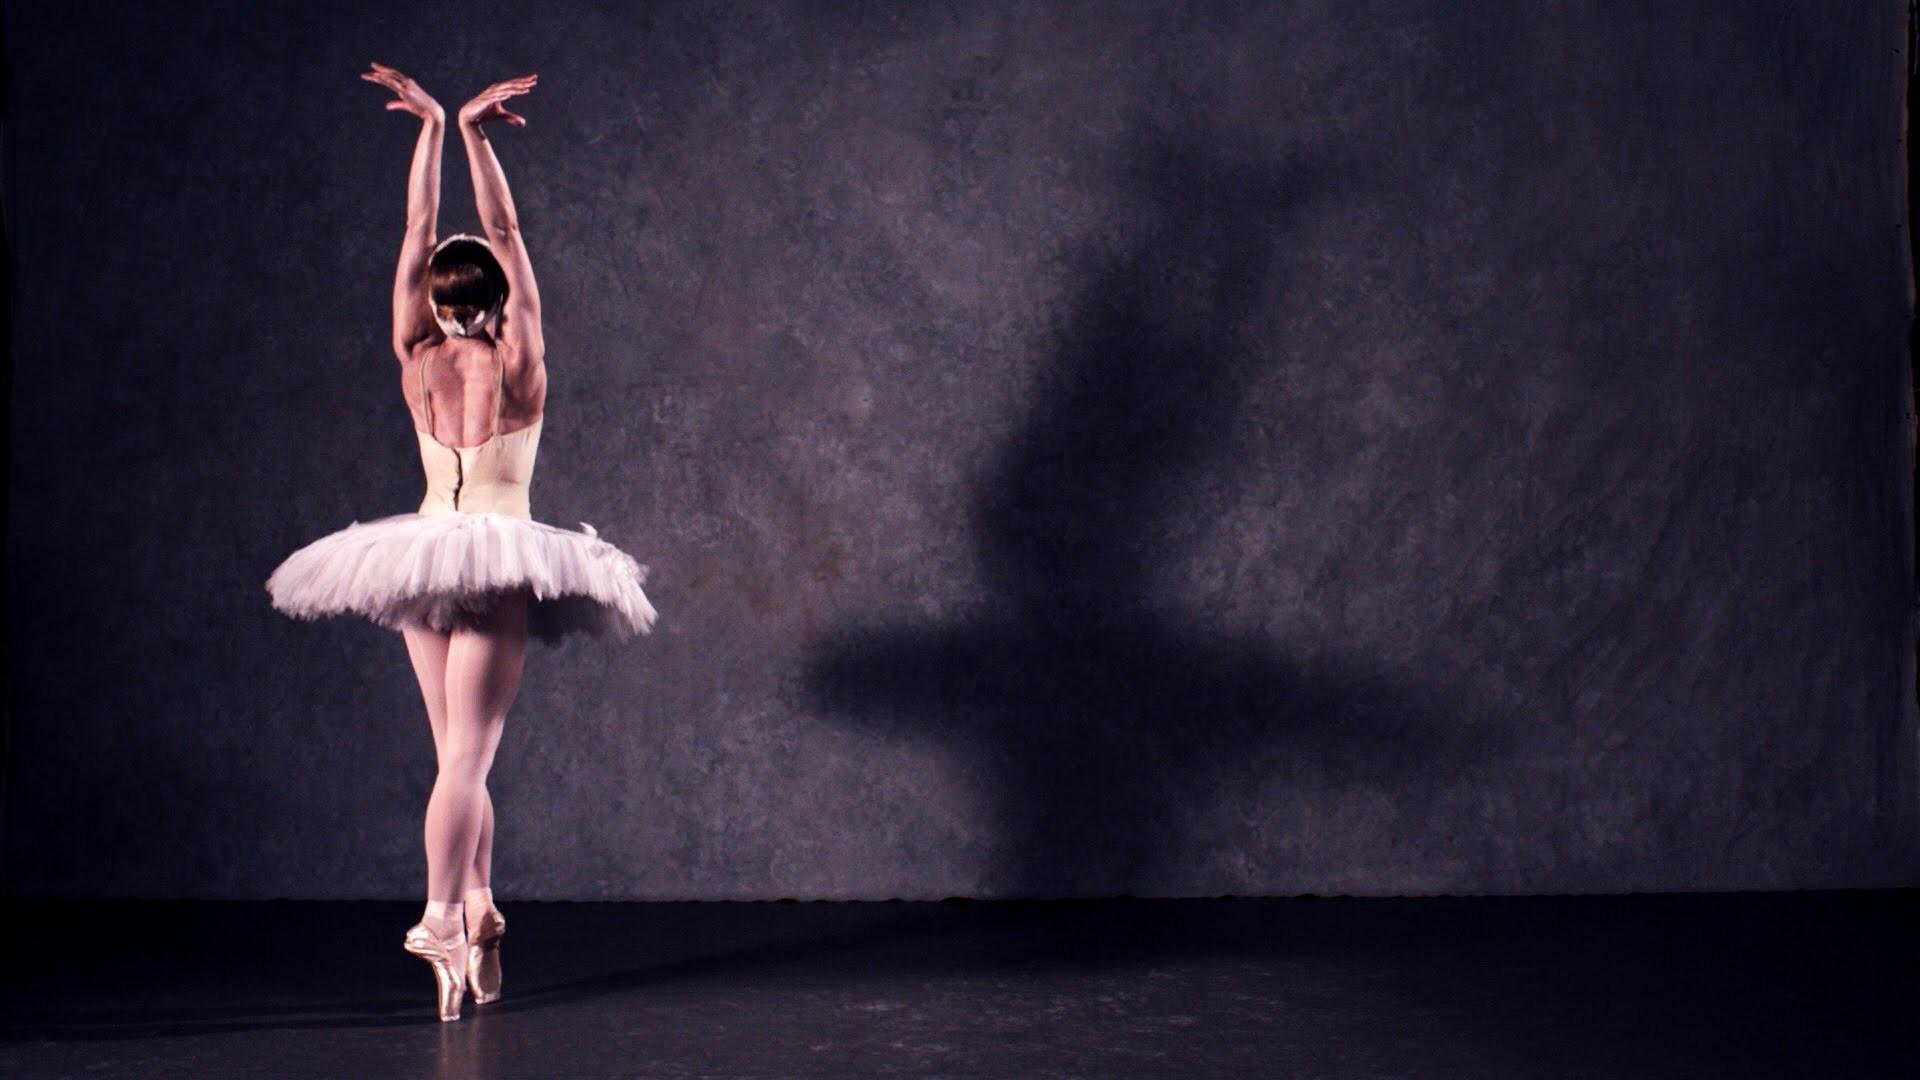 Ballet Dance Wallpapers with HD Desktop 1920x1080 px 212 1920x1080